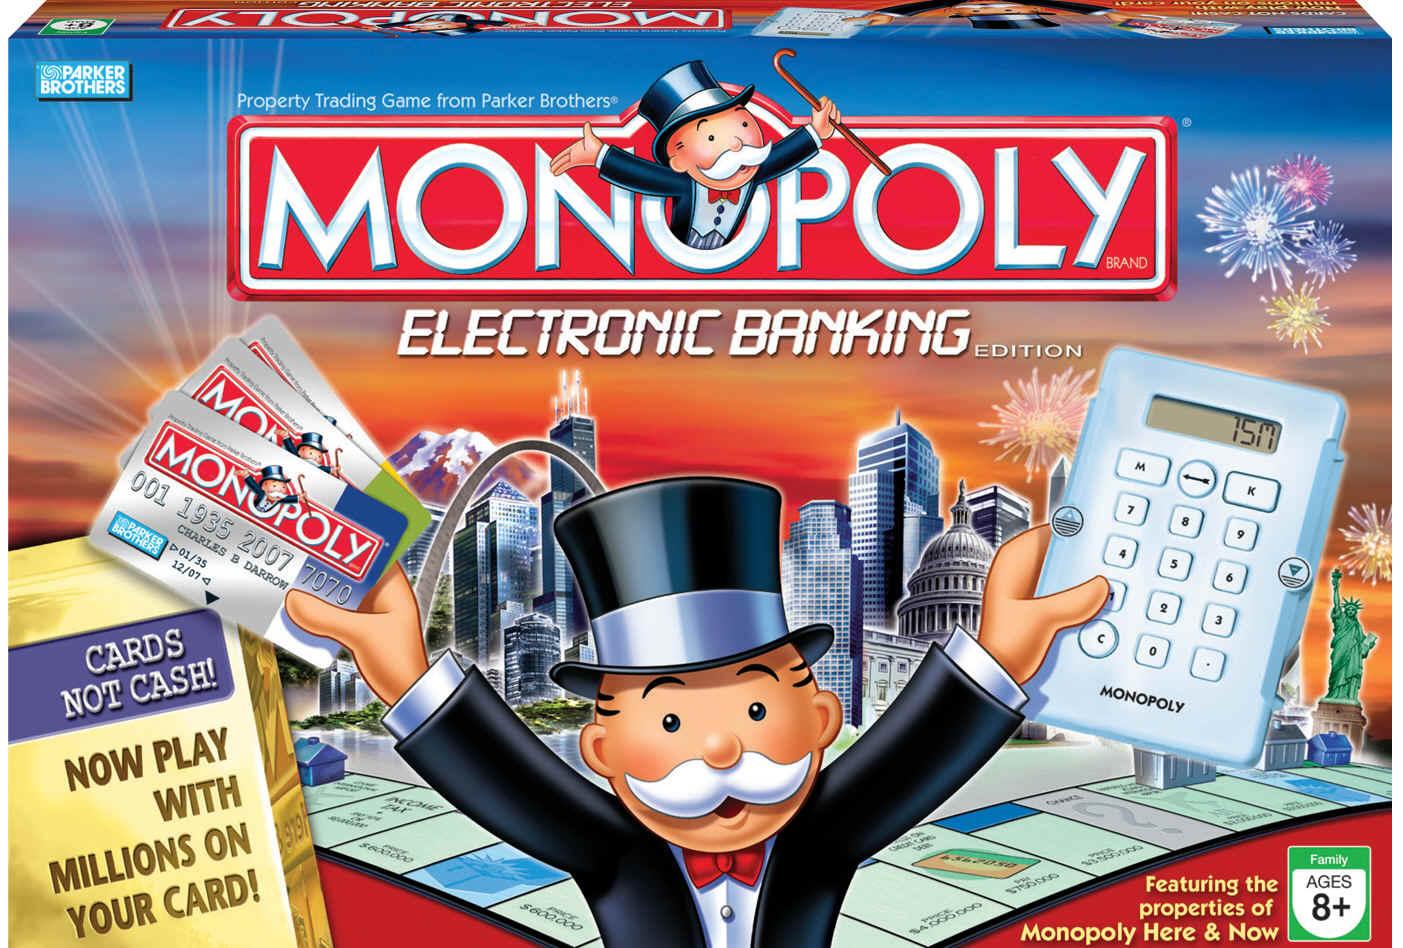 Mια εικόνα και μια λέξη... - Σελίδα 37 Monopoly